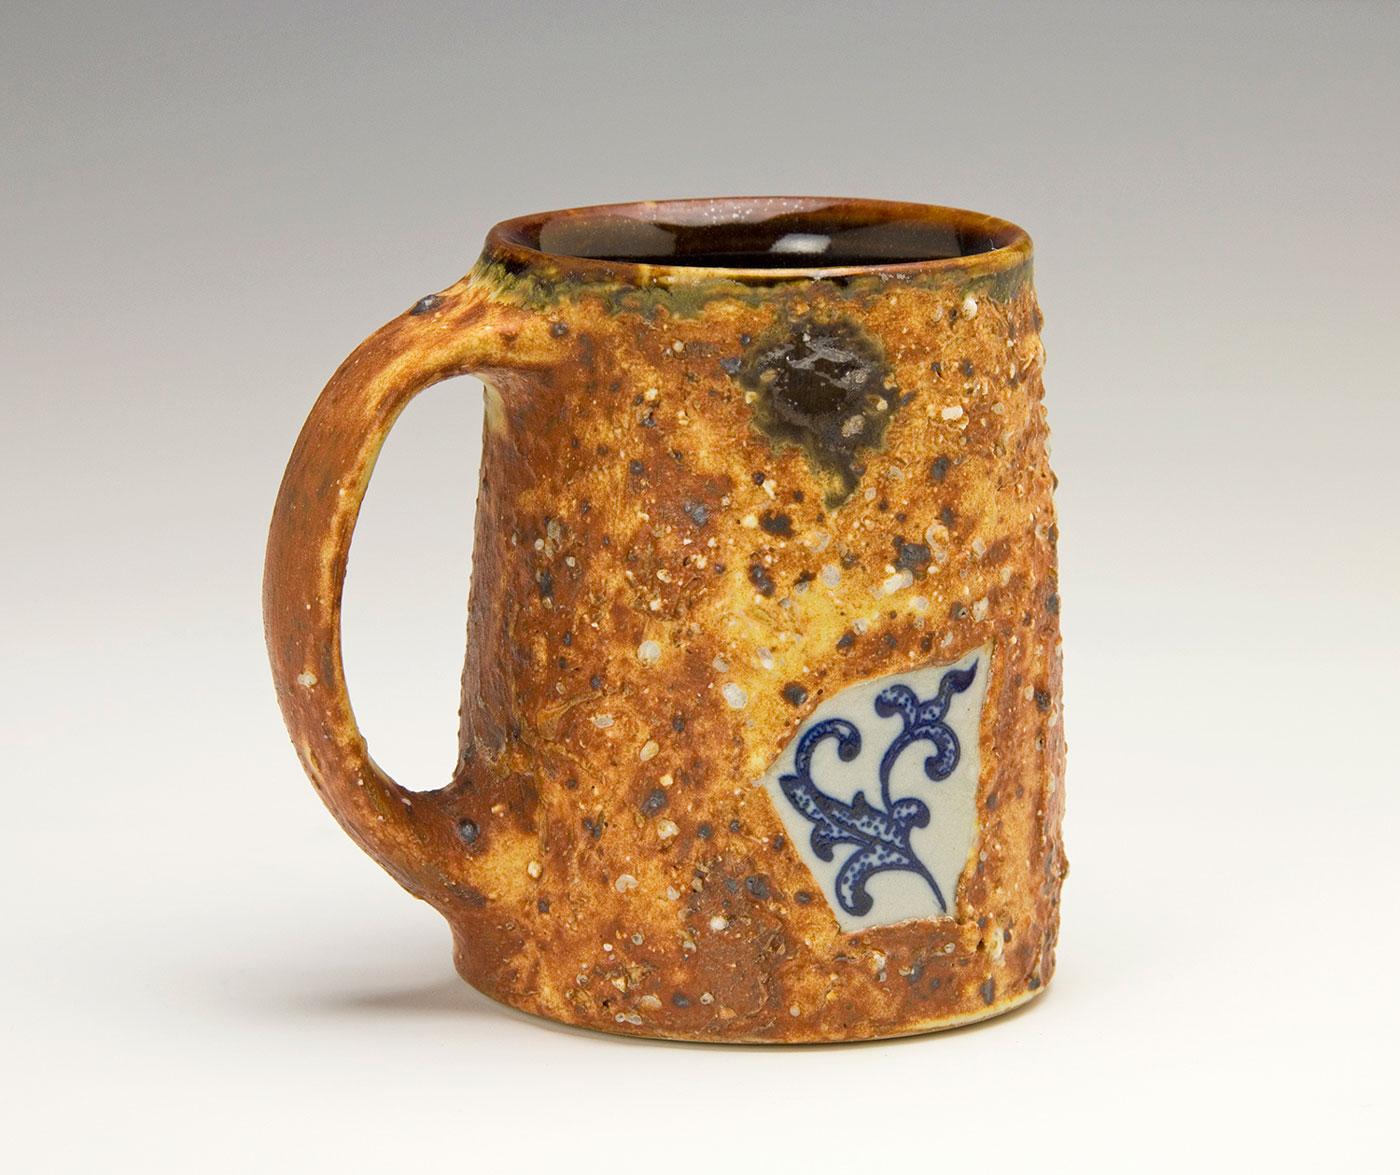 Art-Mug-Wild-Clay-Bruce-Gholson-Seagrove-Pottery.jpg